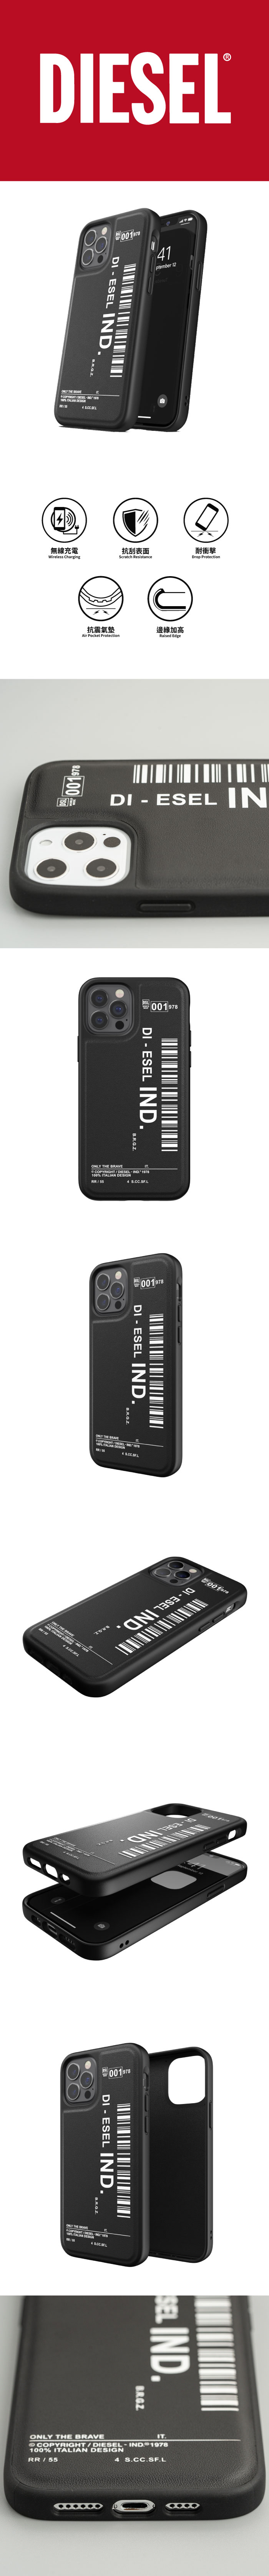 Diesel|iPhone 12 Pro Max 手機殼 條碼